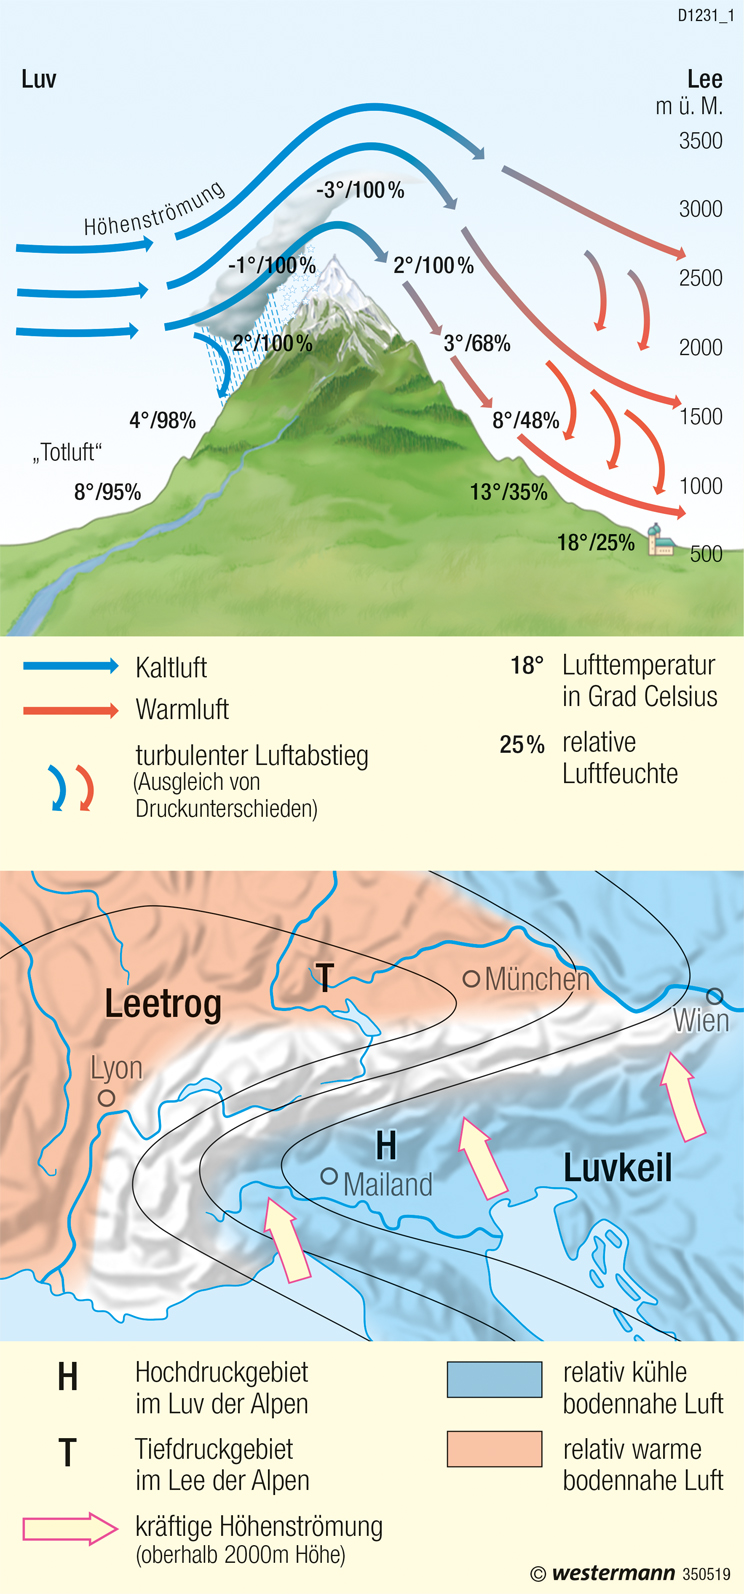 Föhnwind (regionales Windsystem) |  | Klima | Karte 59/4